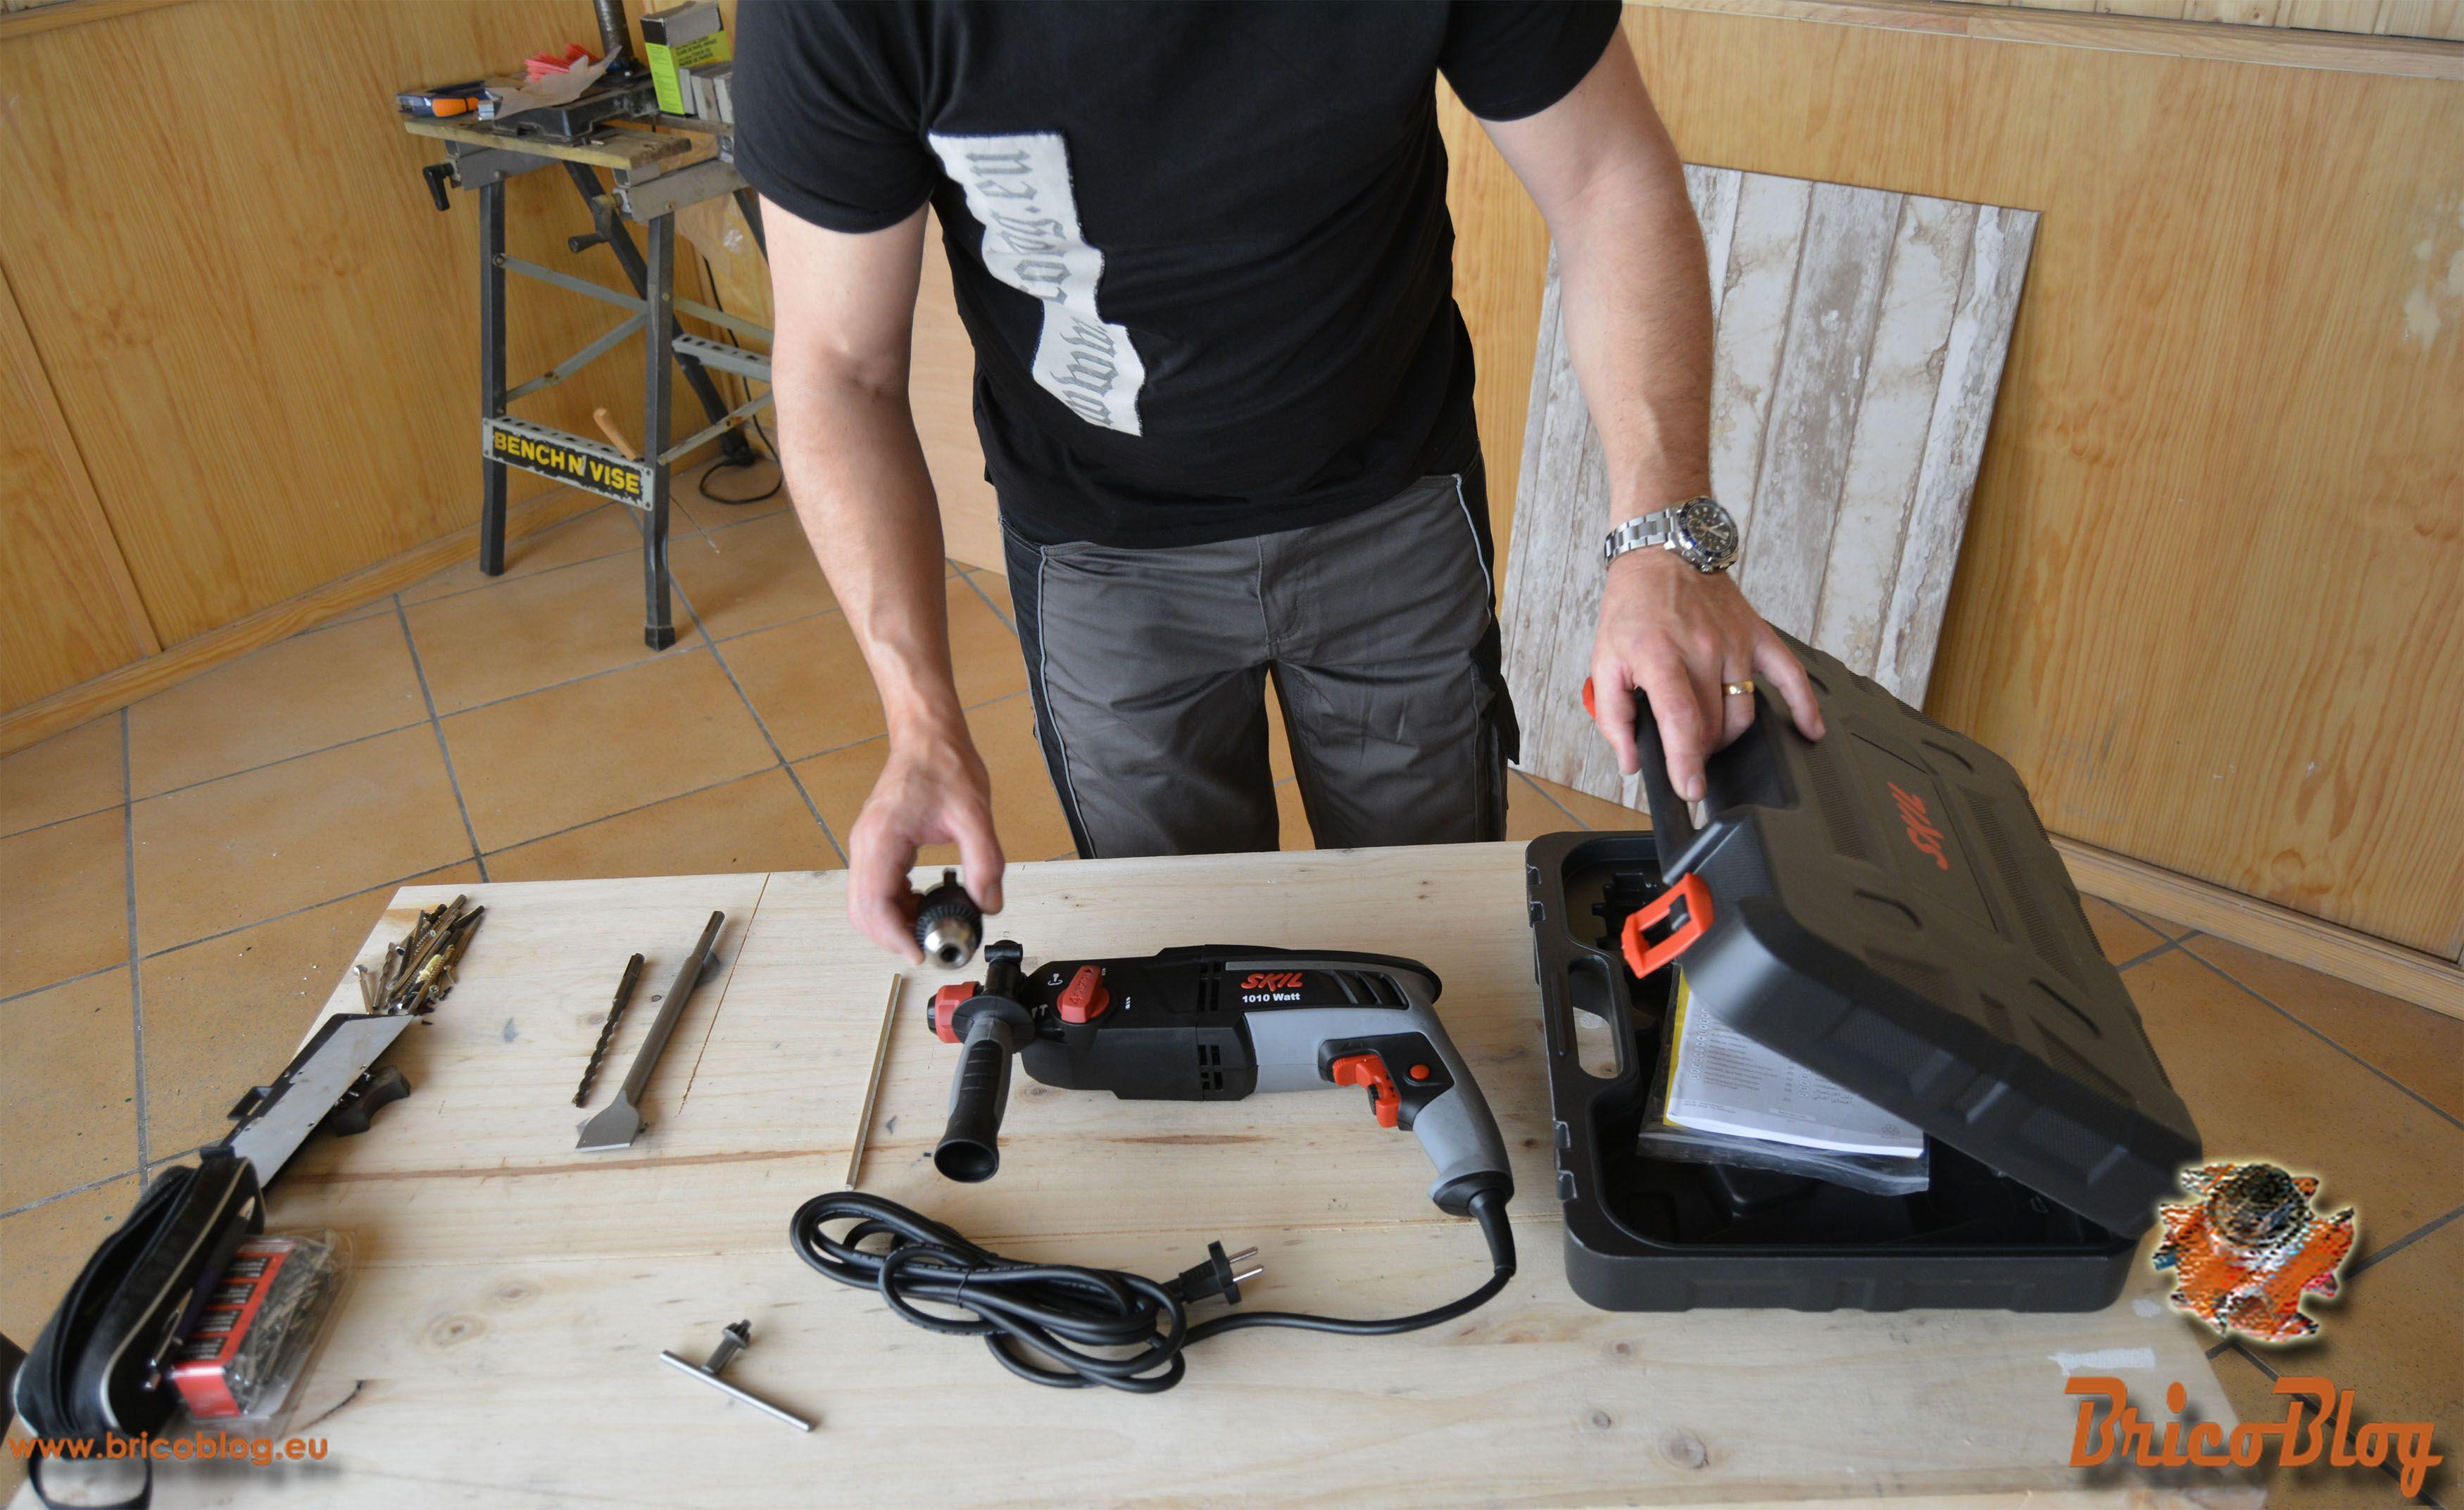 pin by skil power tools on skil diy power tools | pinterest | tools